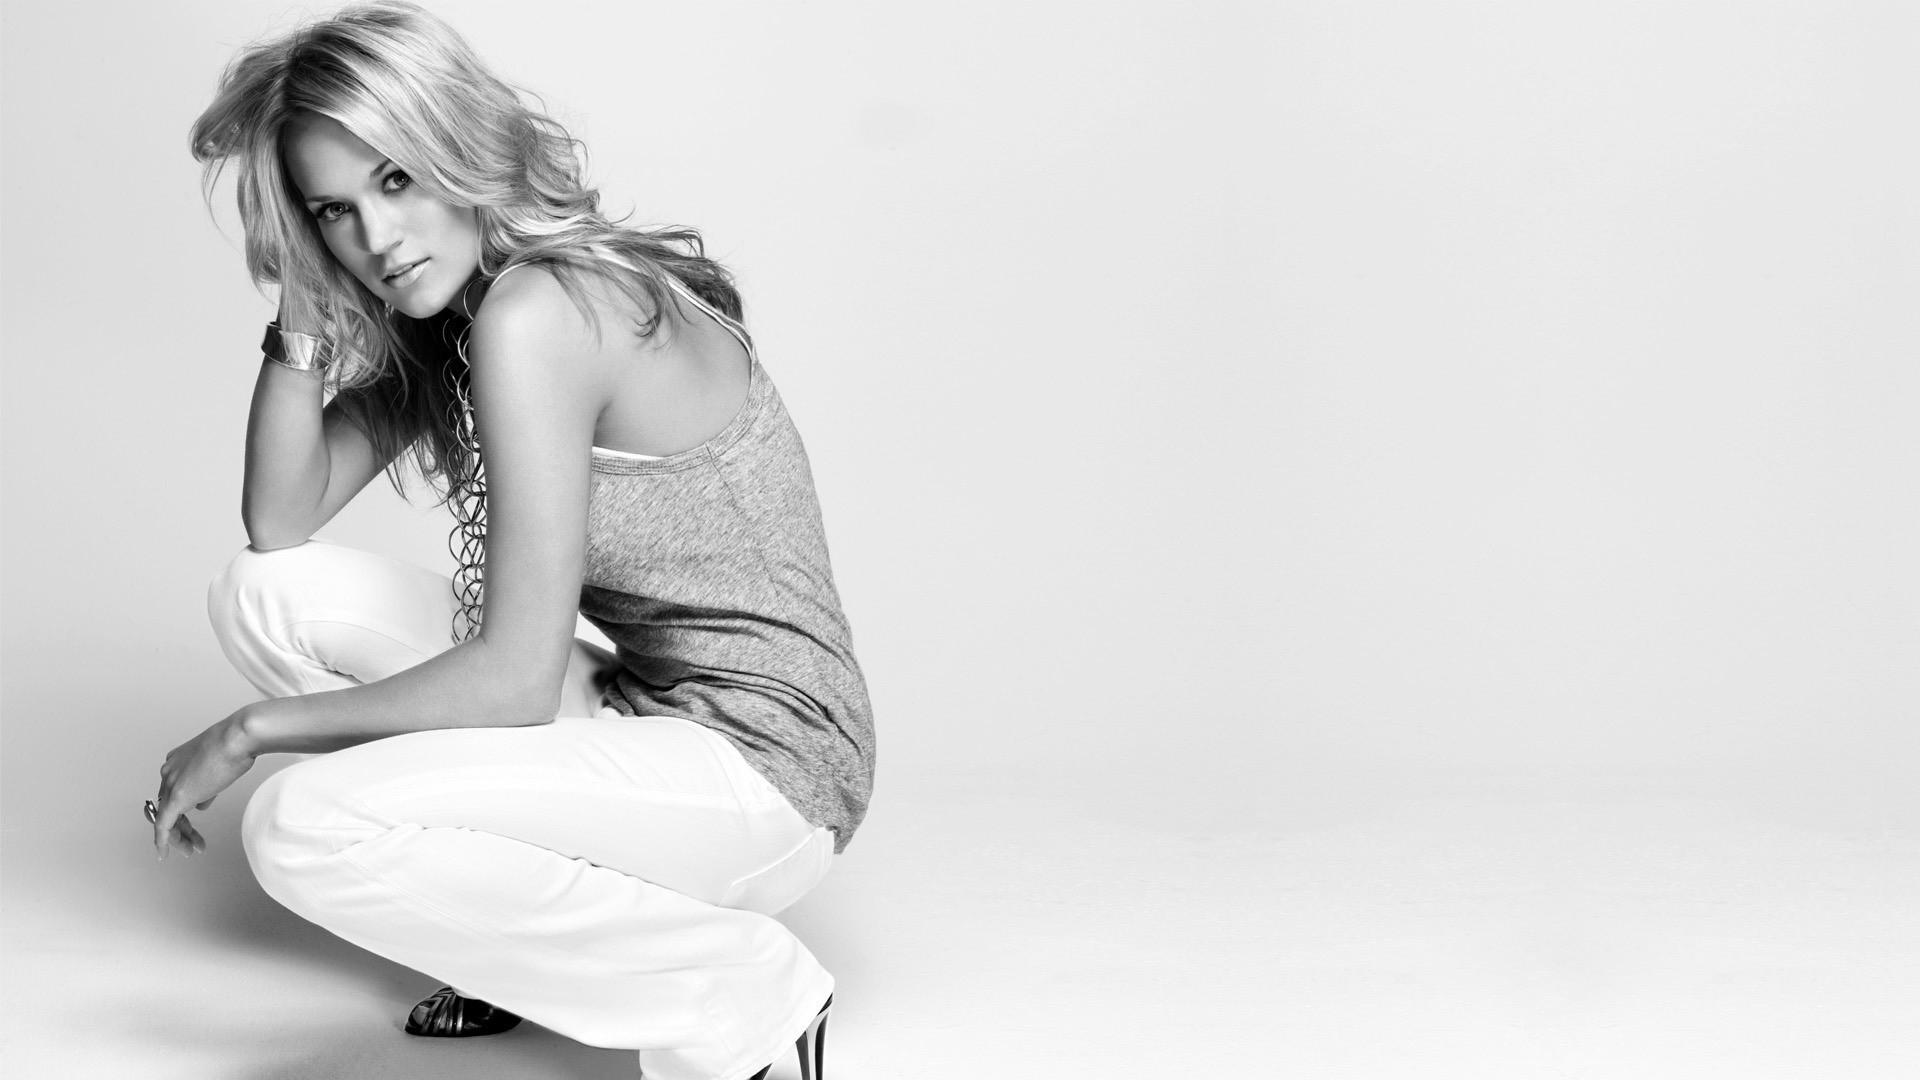 Carrie Underwood Free Download Wallpaper